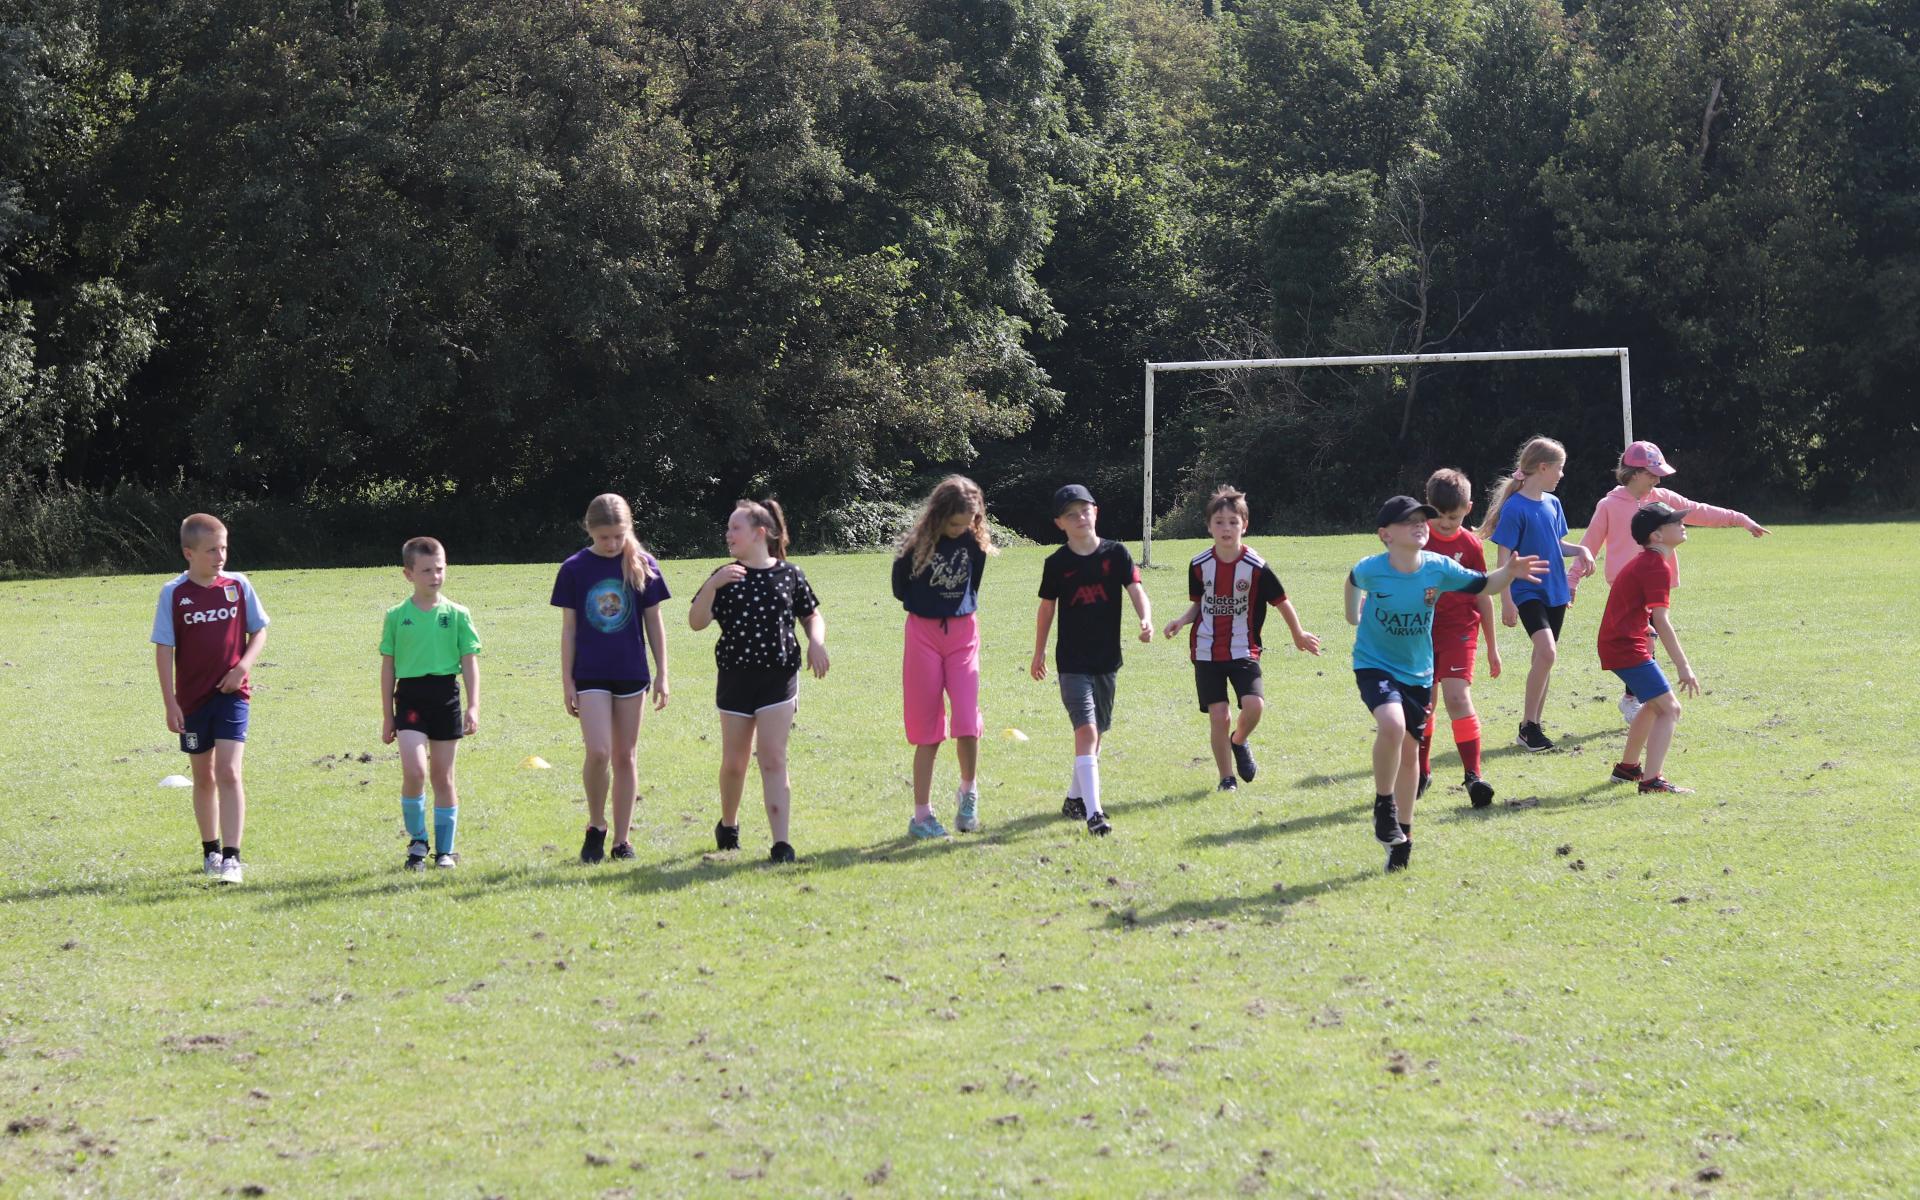 Participants enjoy sport at Somersall Park